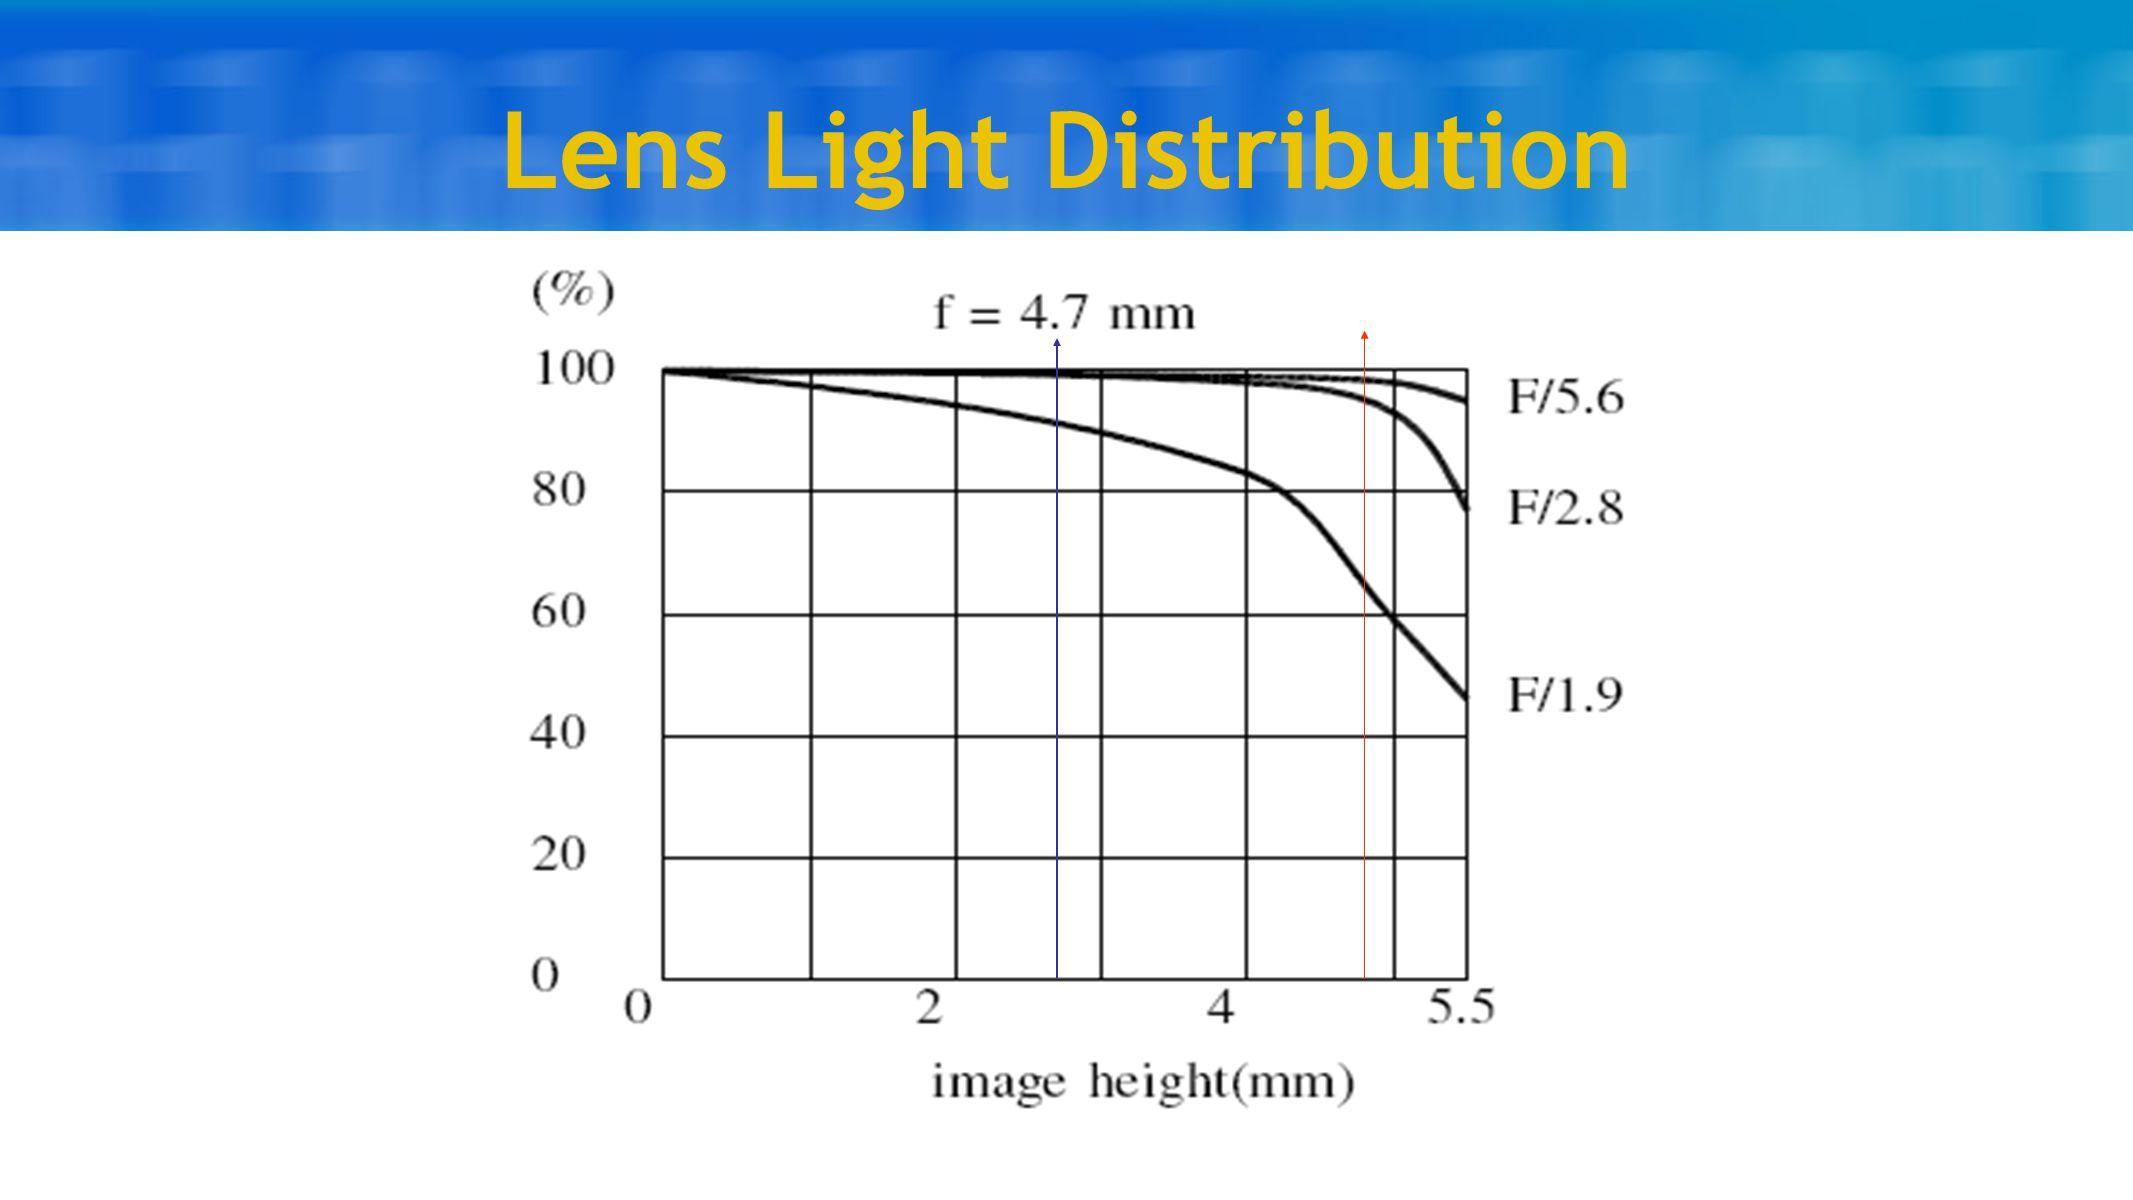 Lens Light Distribution